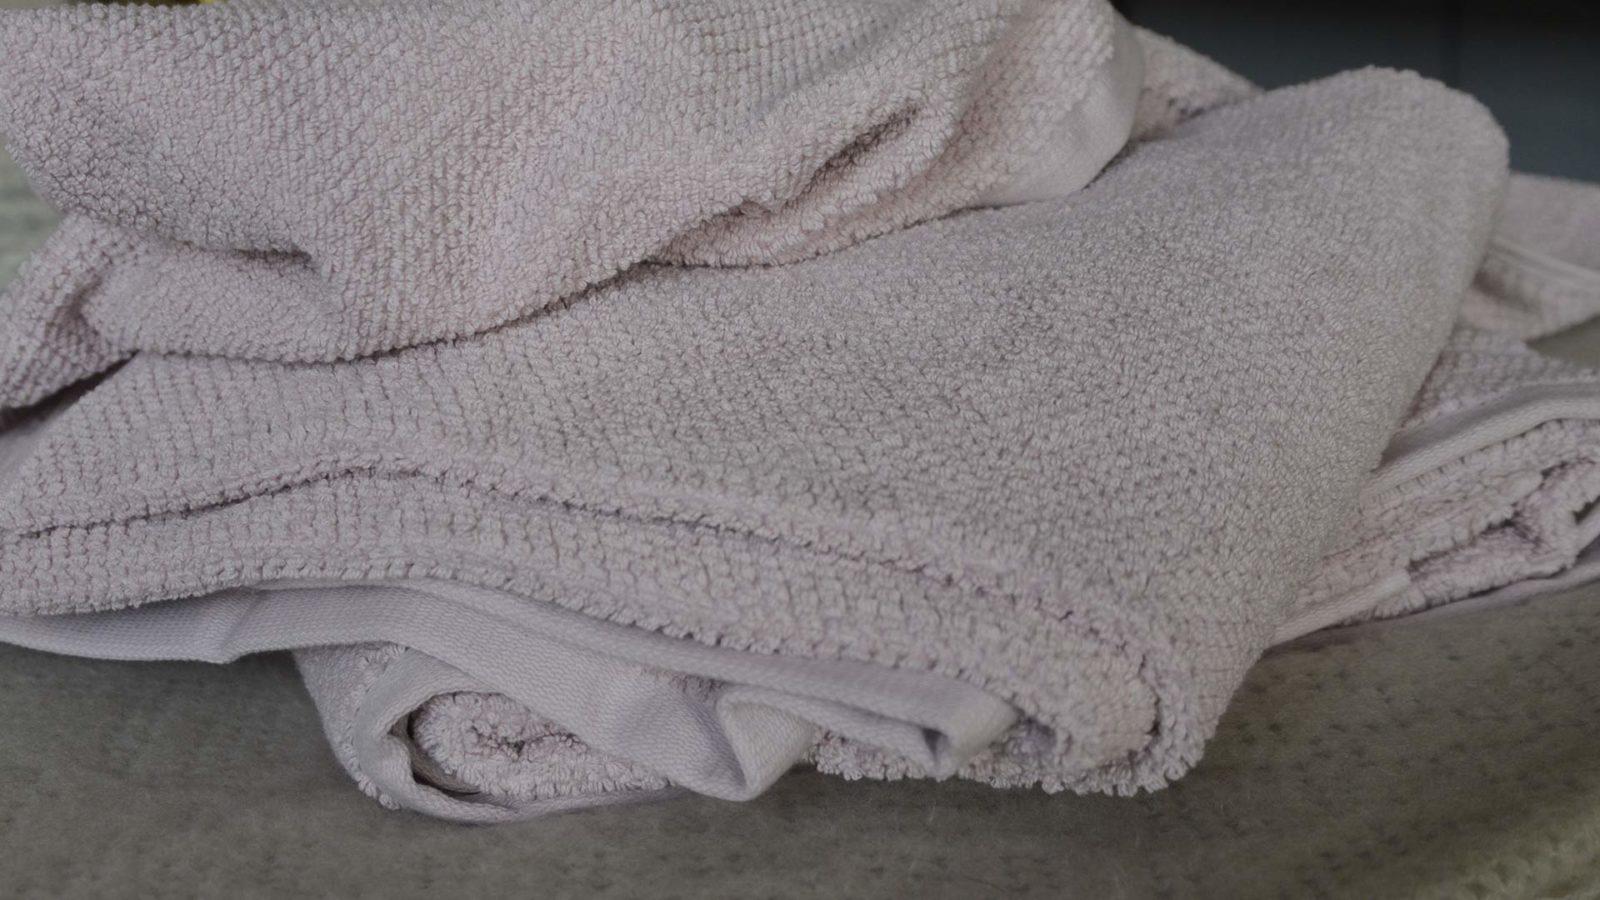 blush-pink-textured-towels